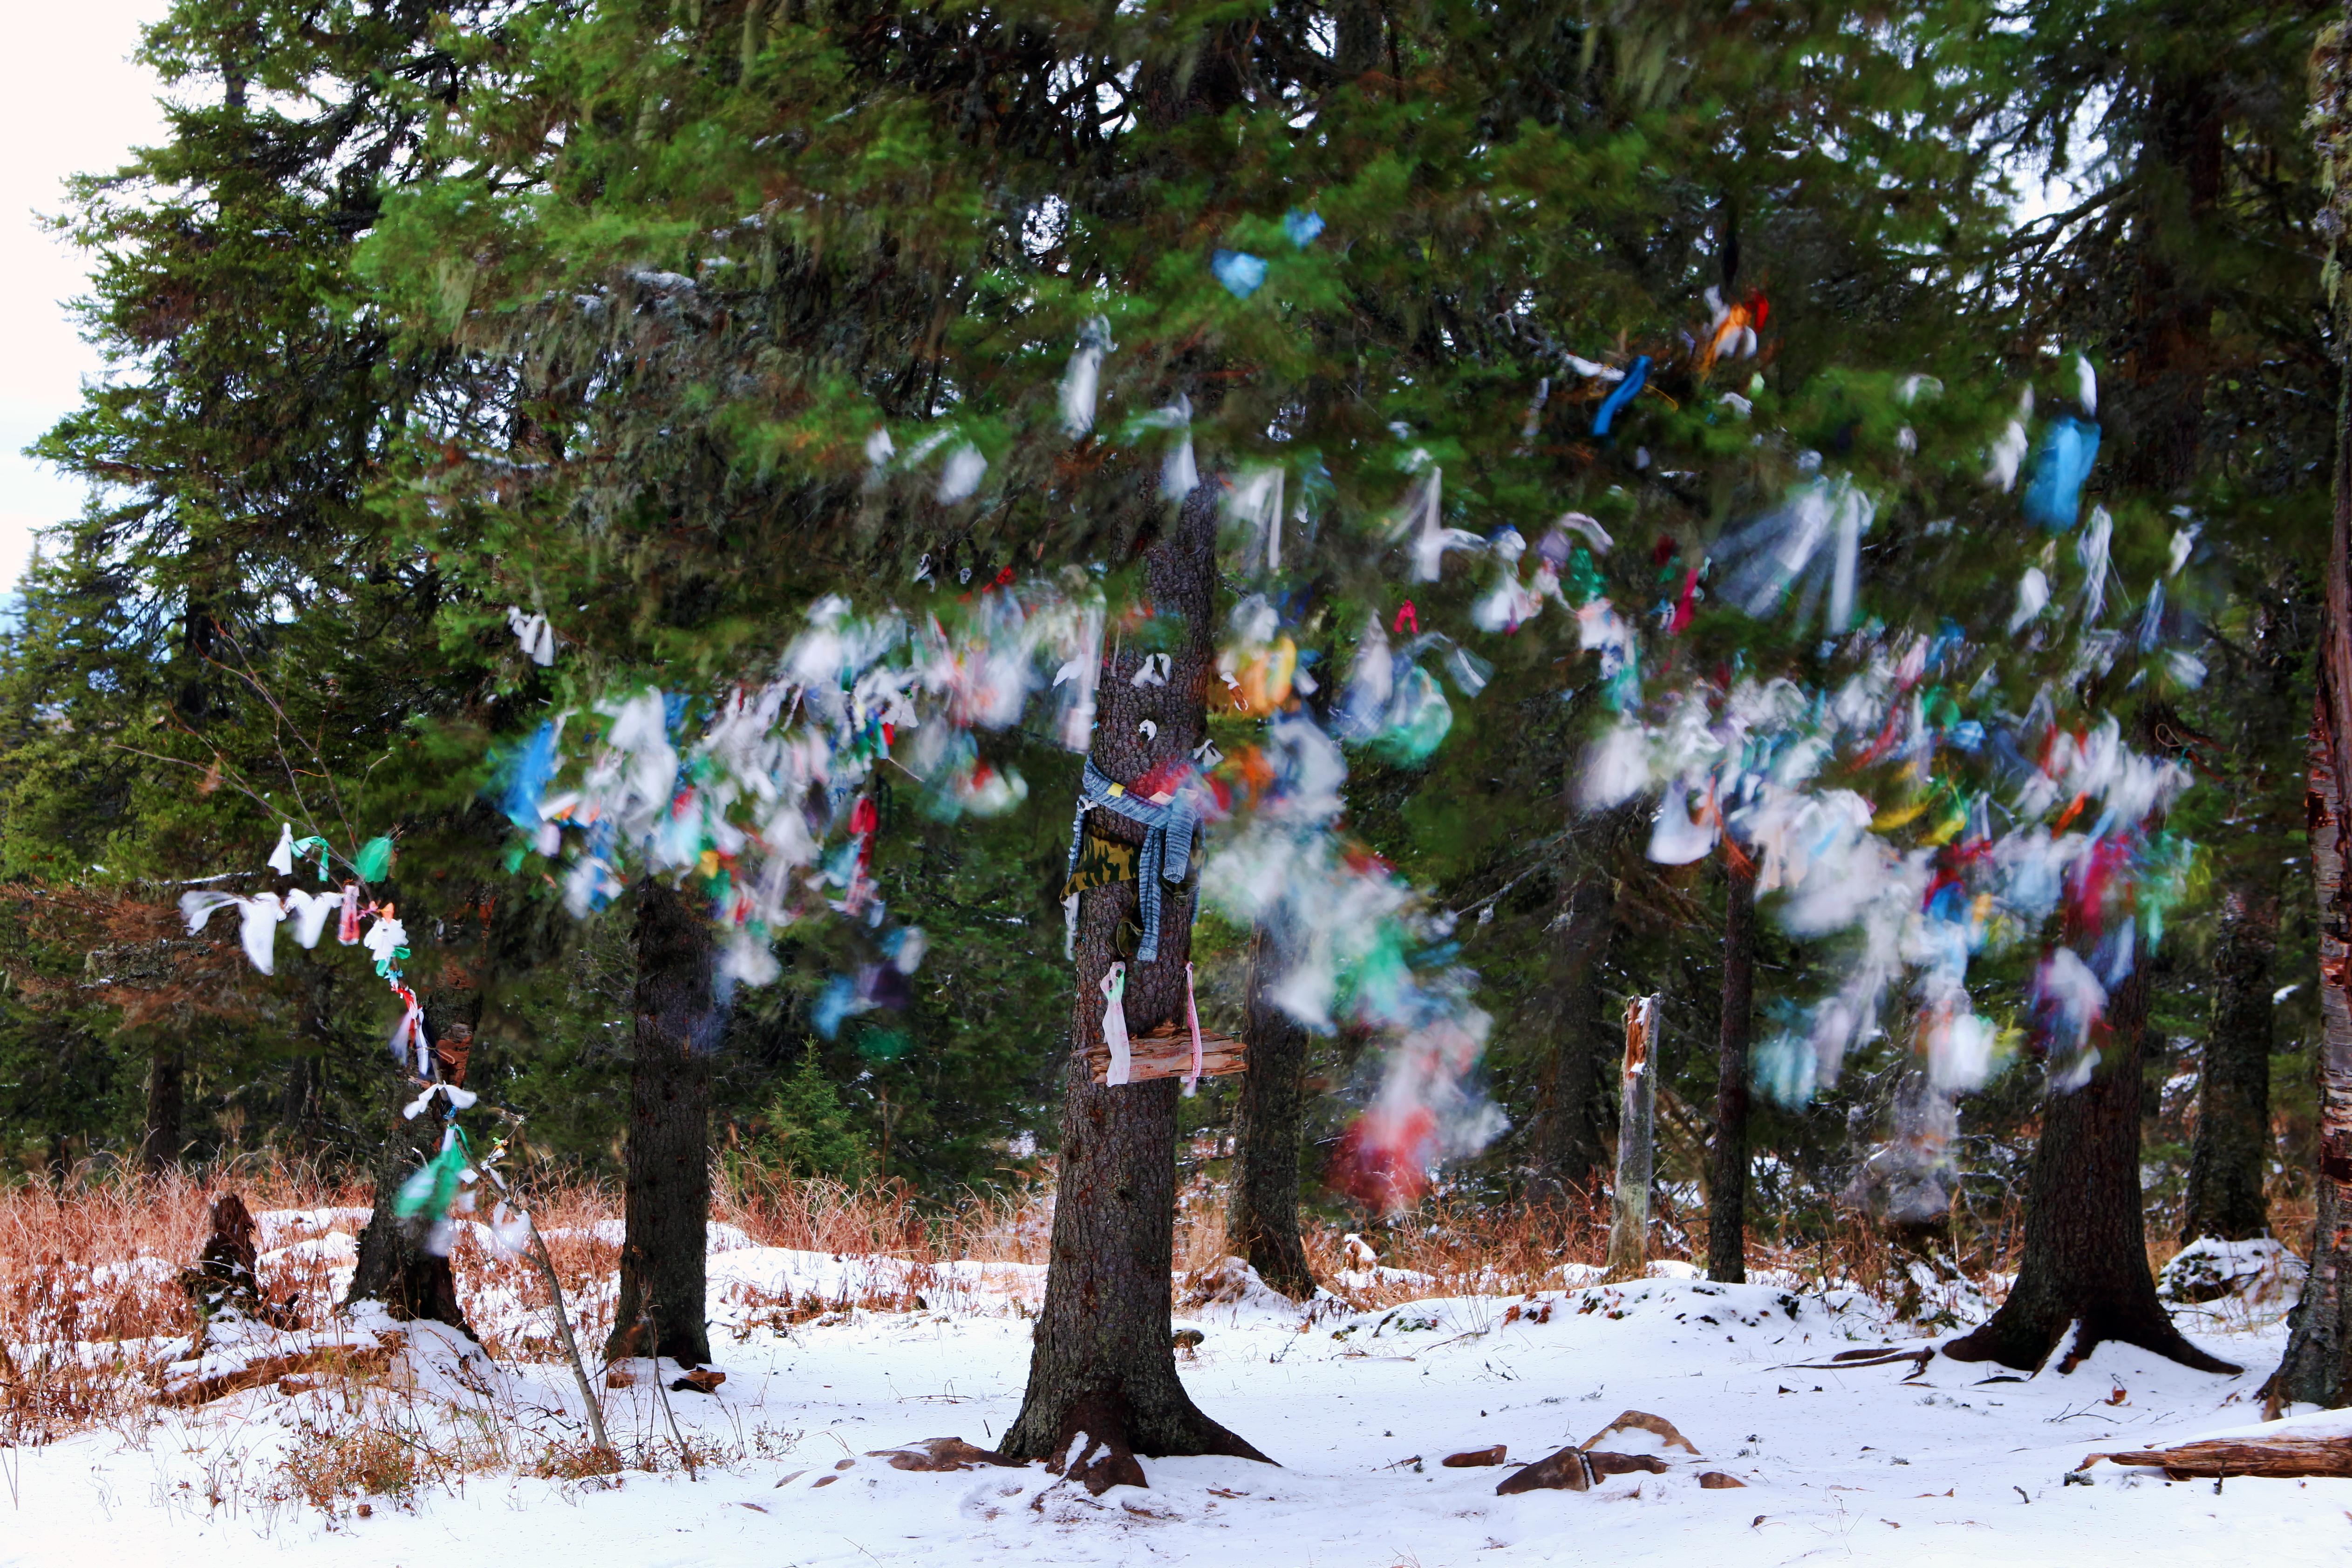 Tree, Accessories, Hanging, Junk, Snow, HQ Photo